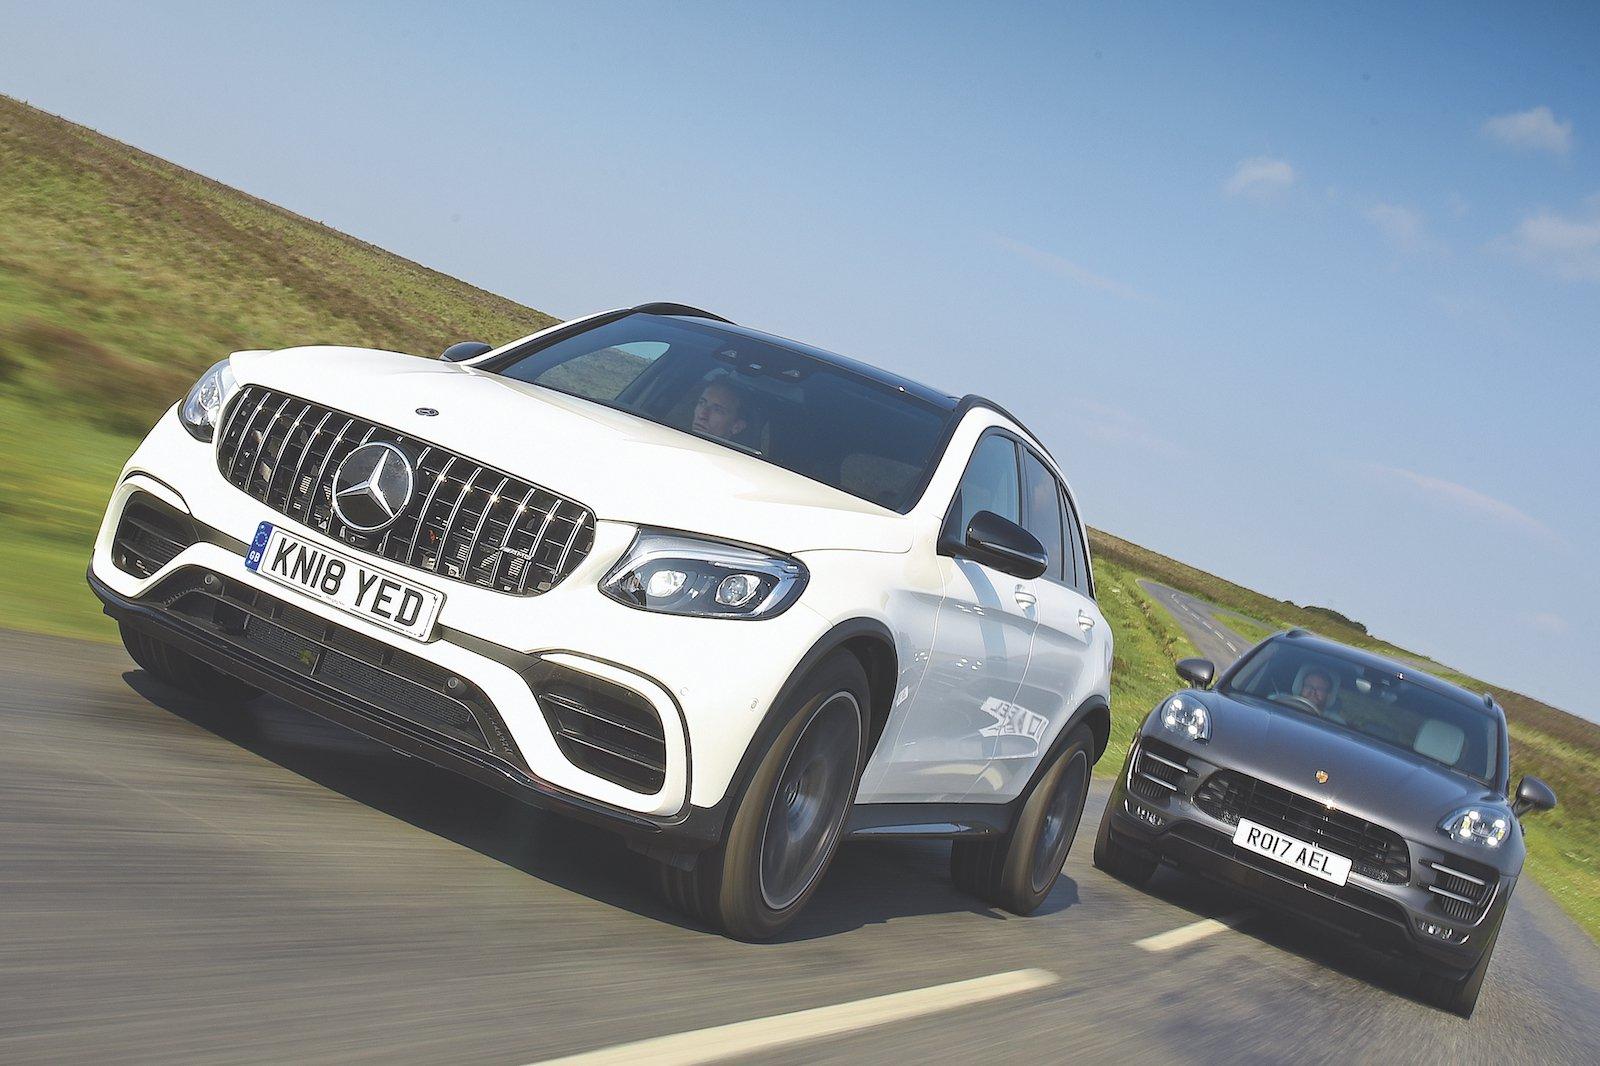 Used test: Mercedes-AMG GLC vs Porsche Macan